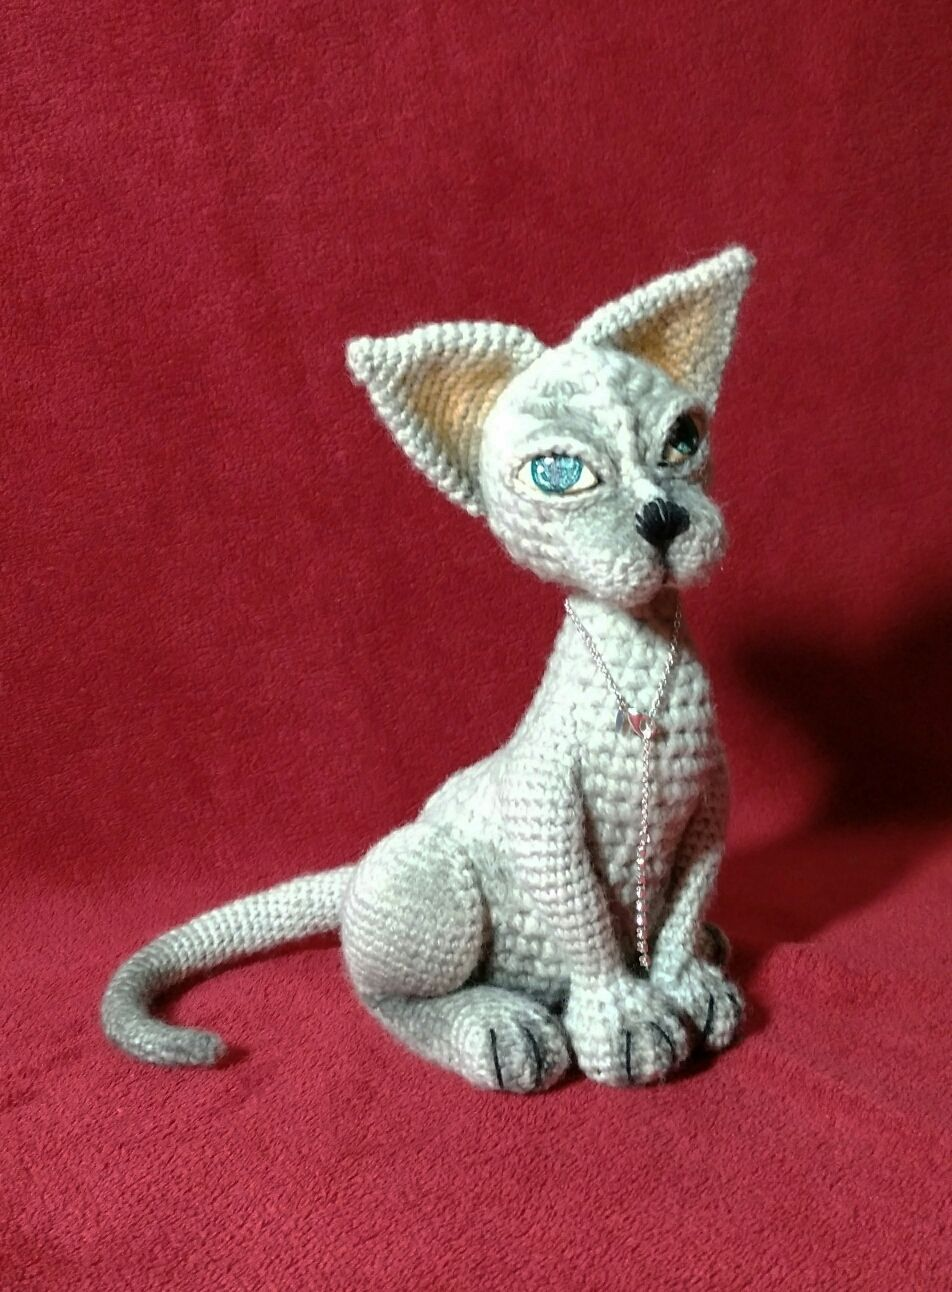 Кот сфинкс, Мягкие игрушки, Винница,  Фото №1